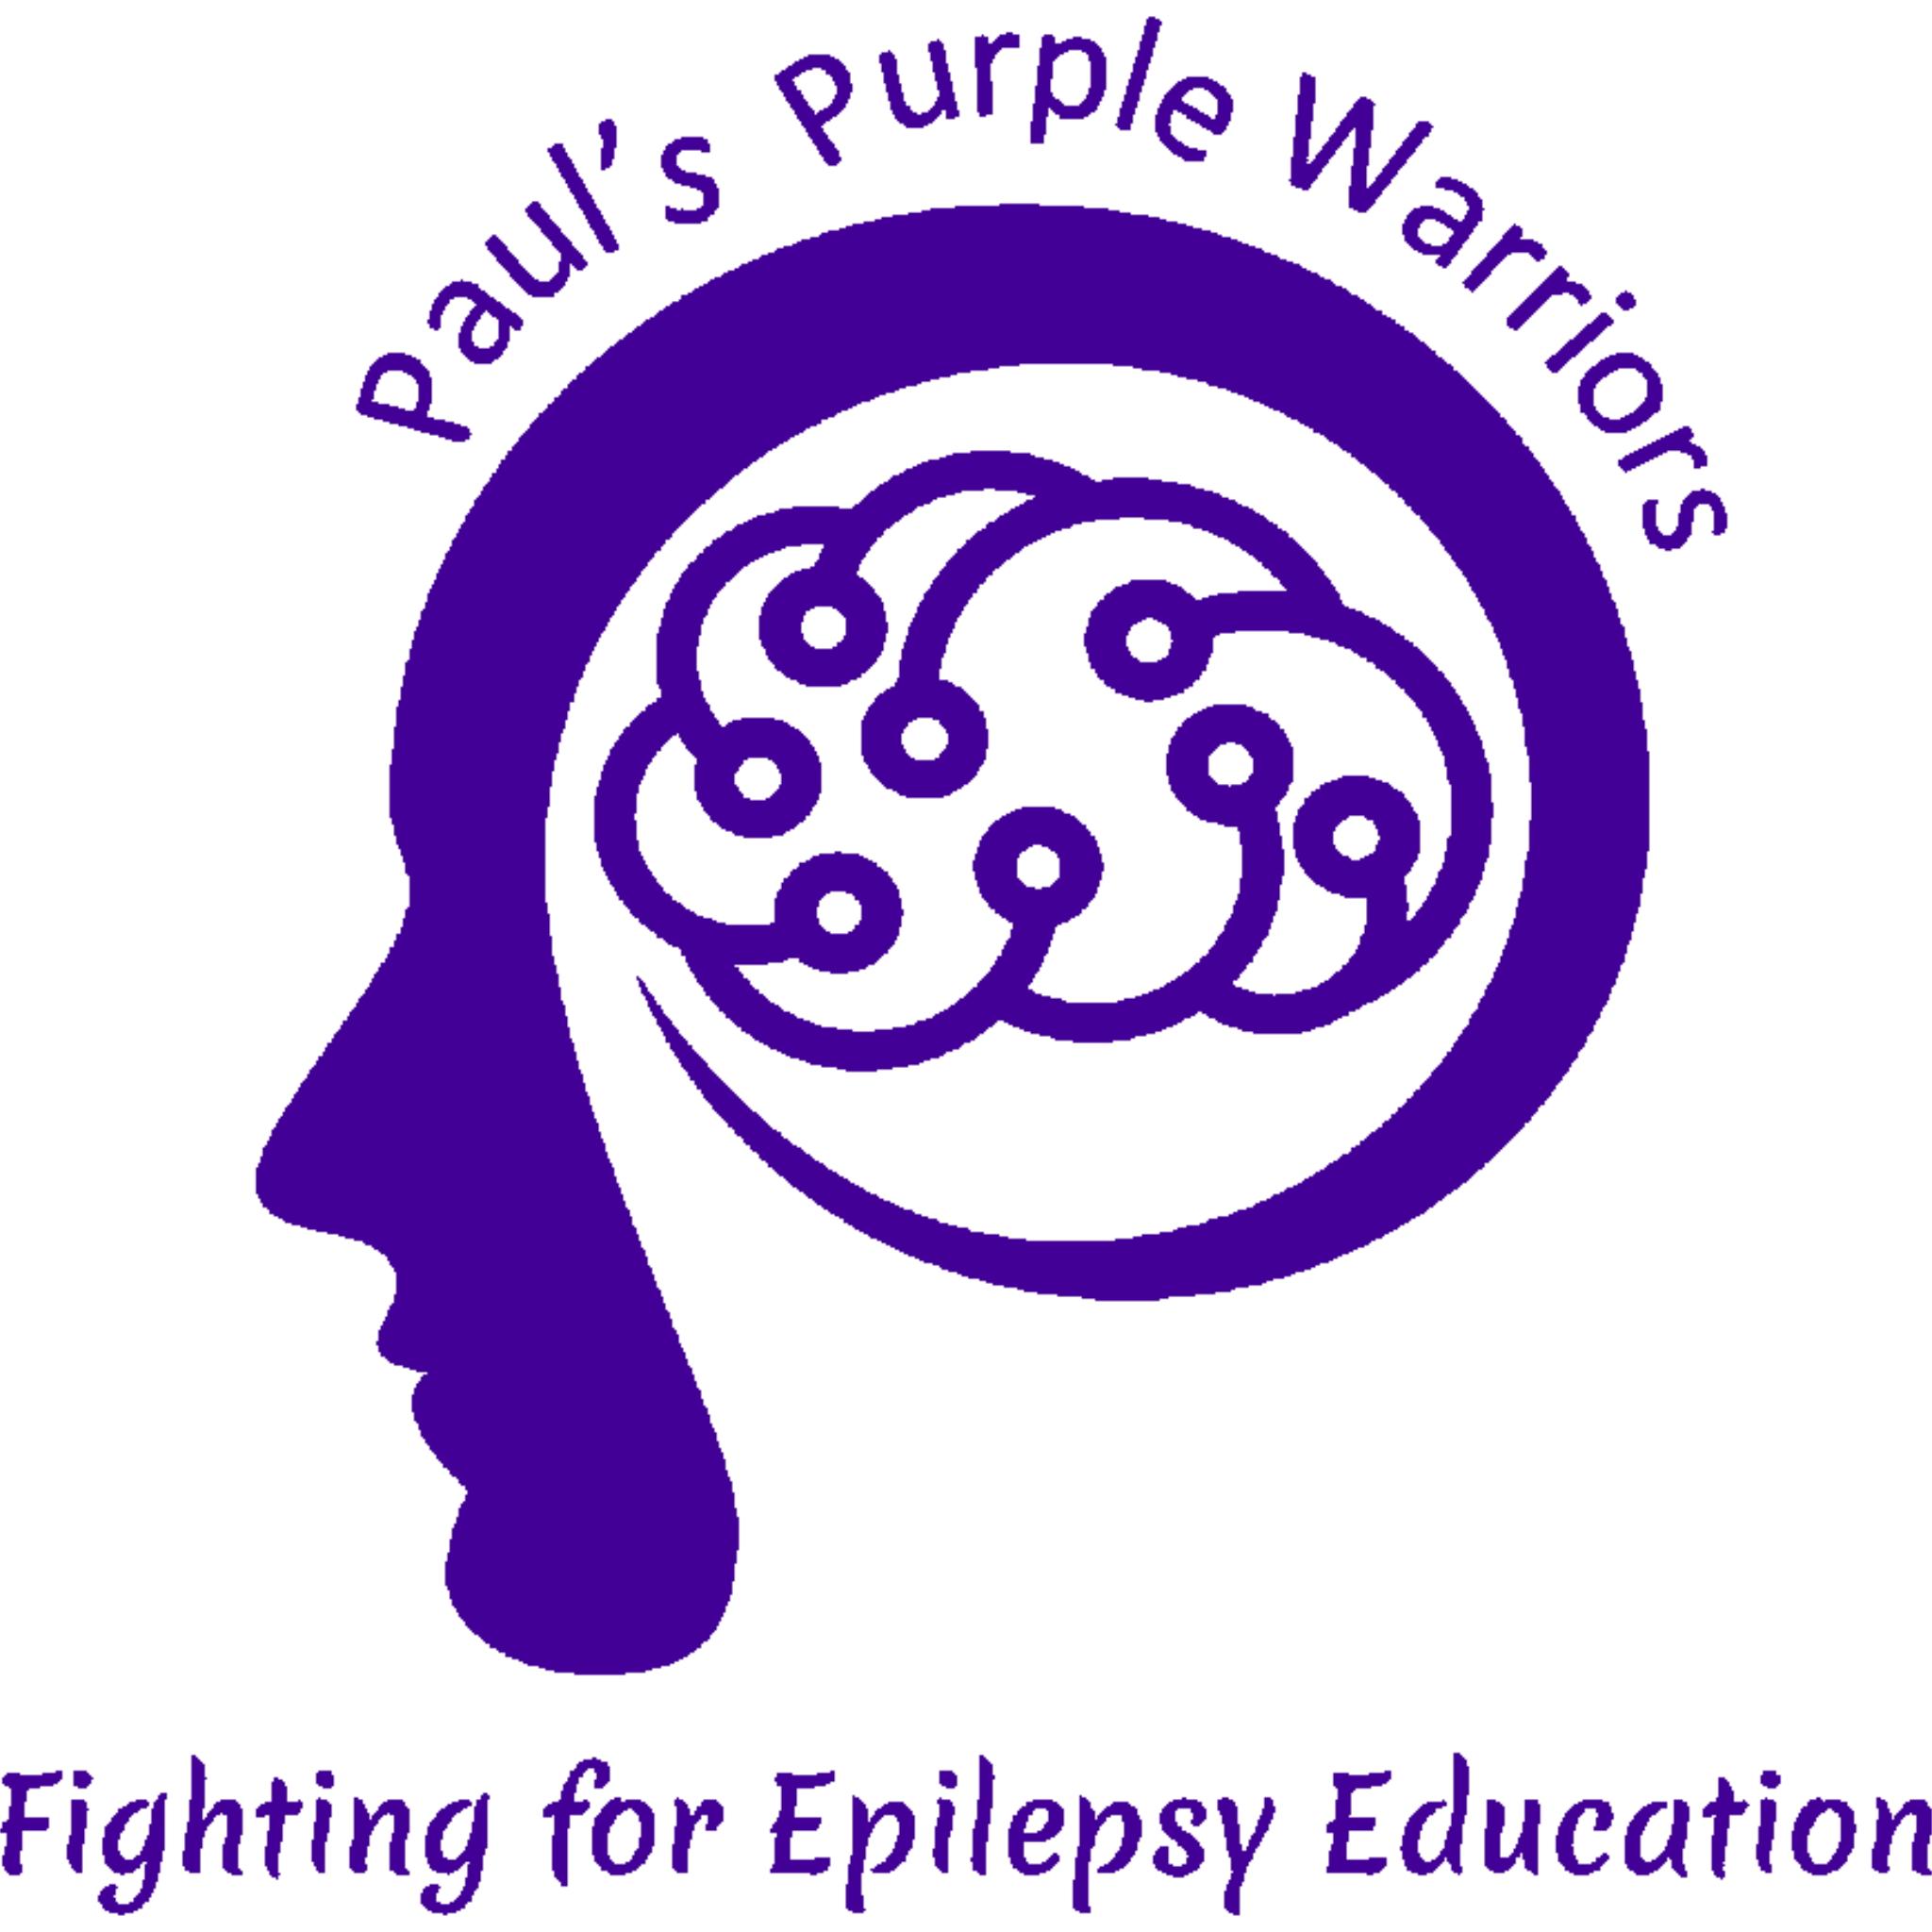 Paul's Purple Warriors